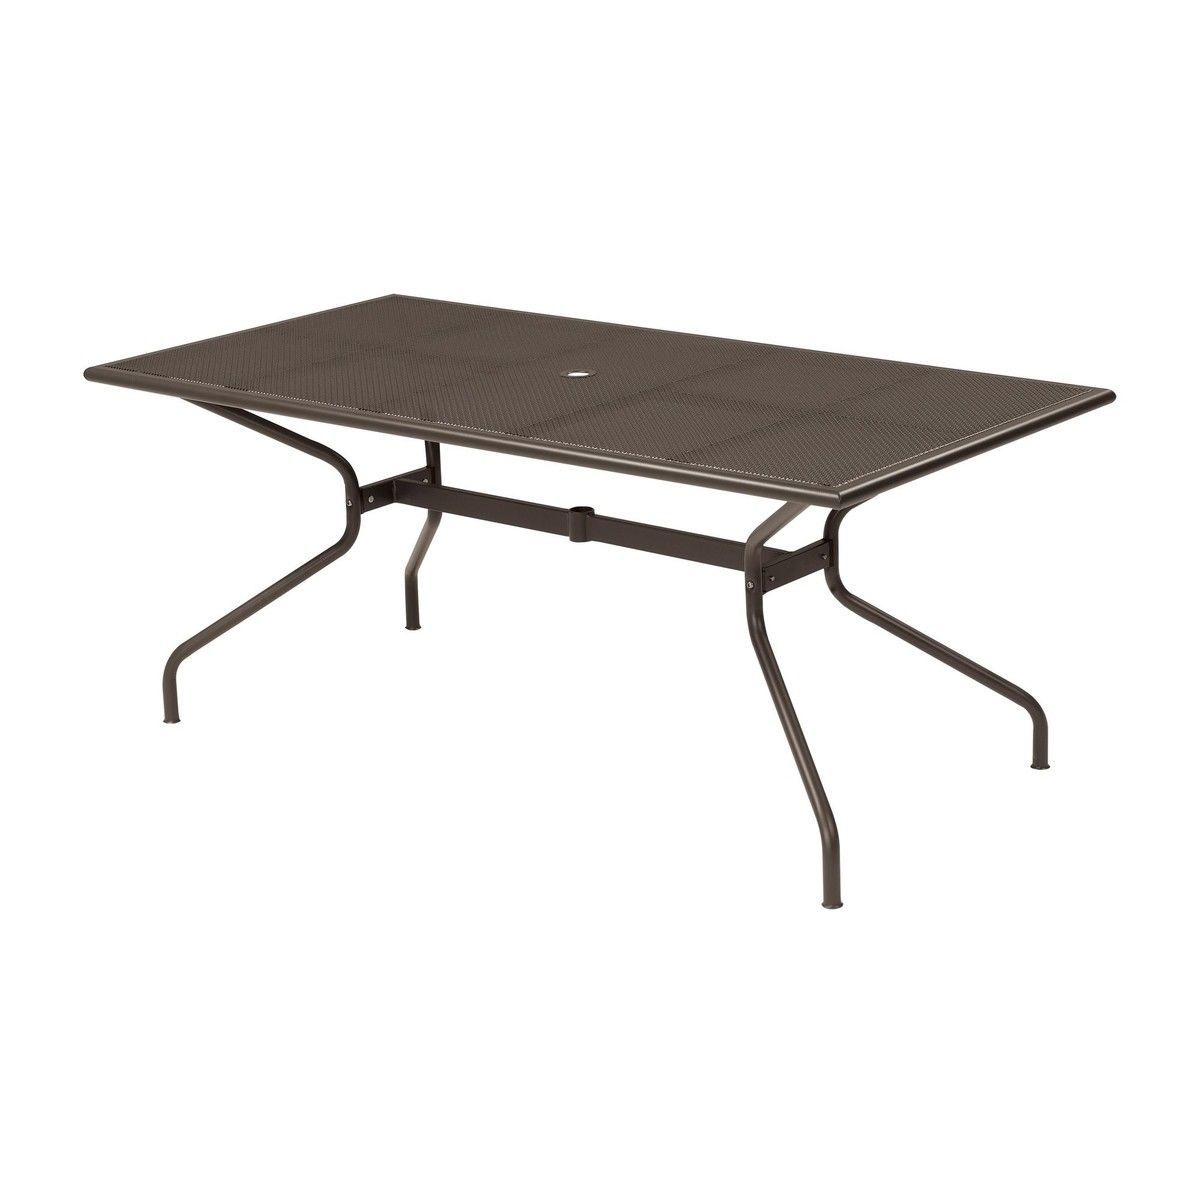 Emejing Table De Jardin Ronde Solid Emu Gallery - House Design ...